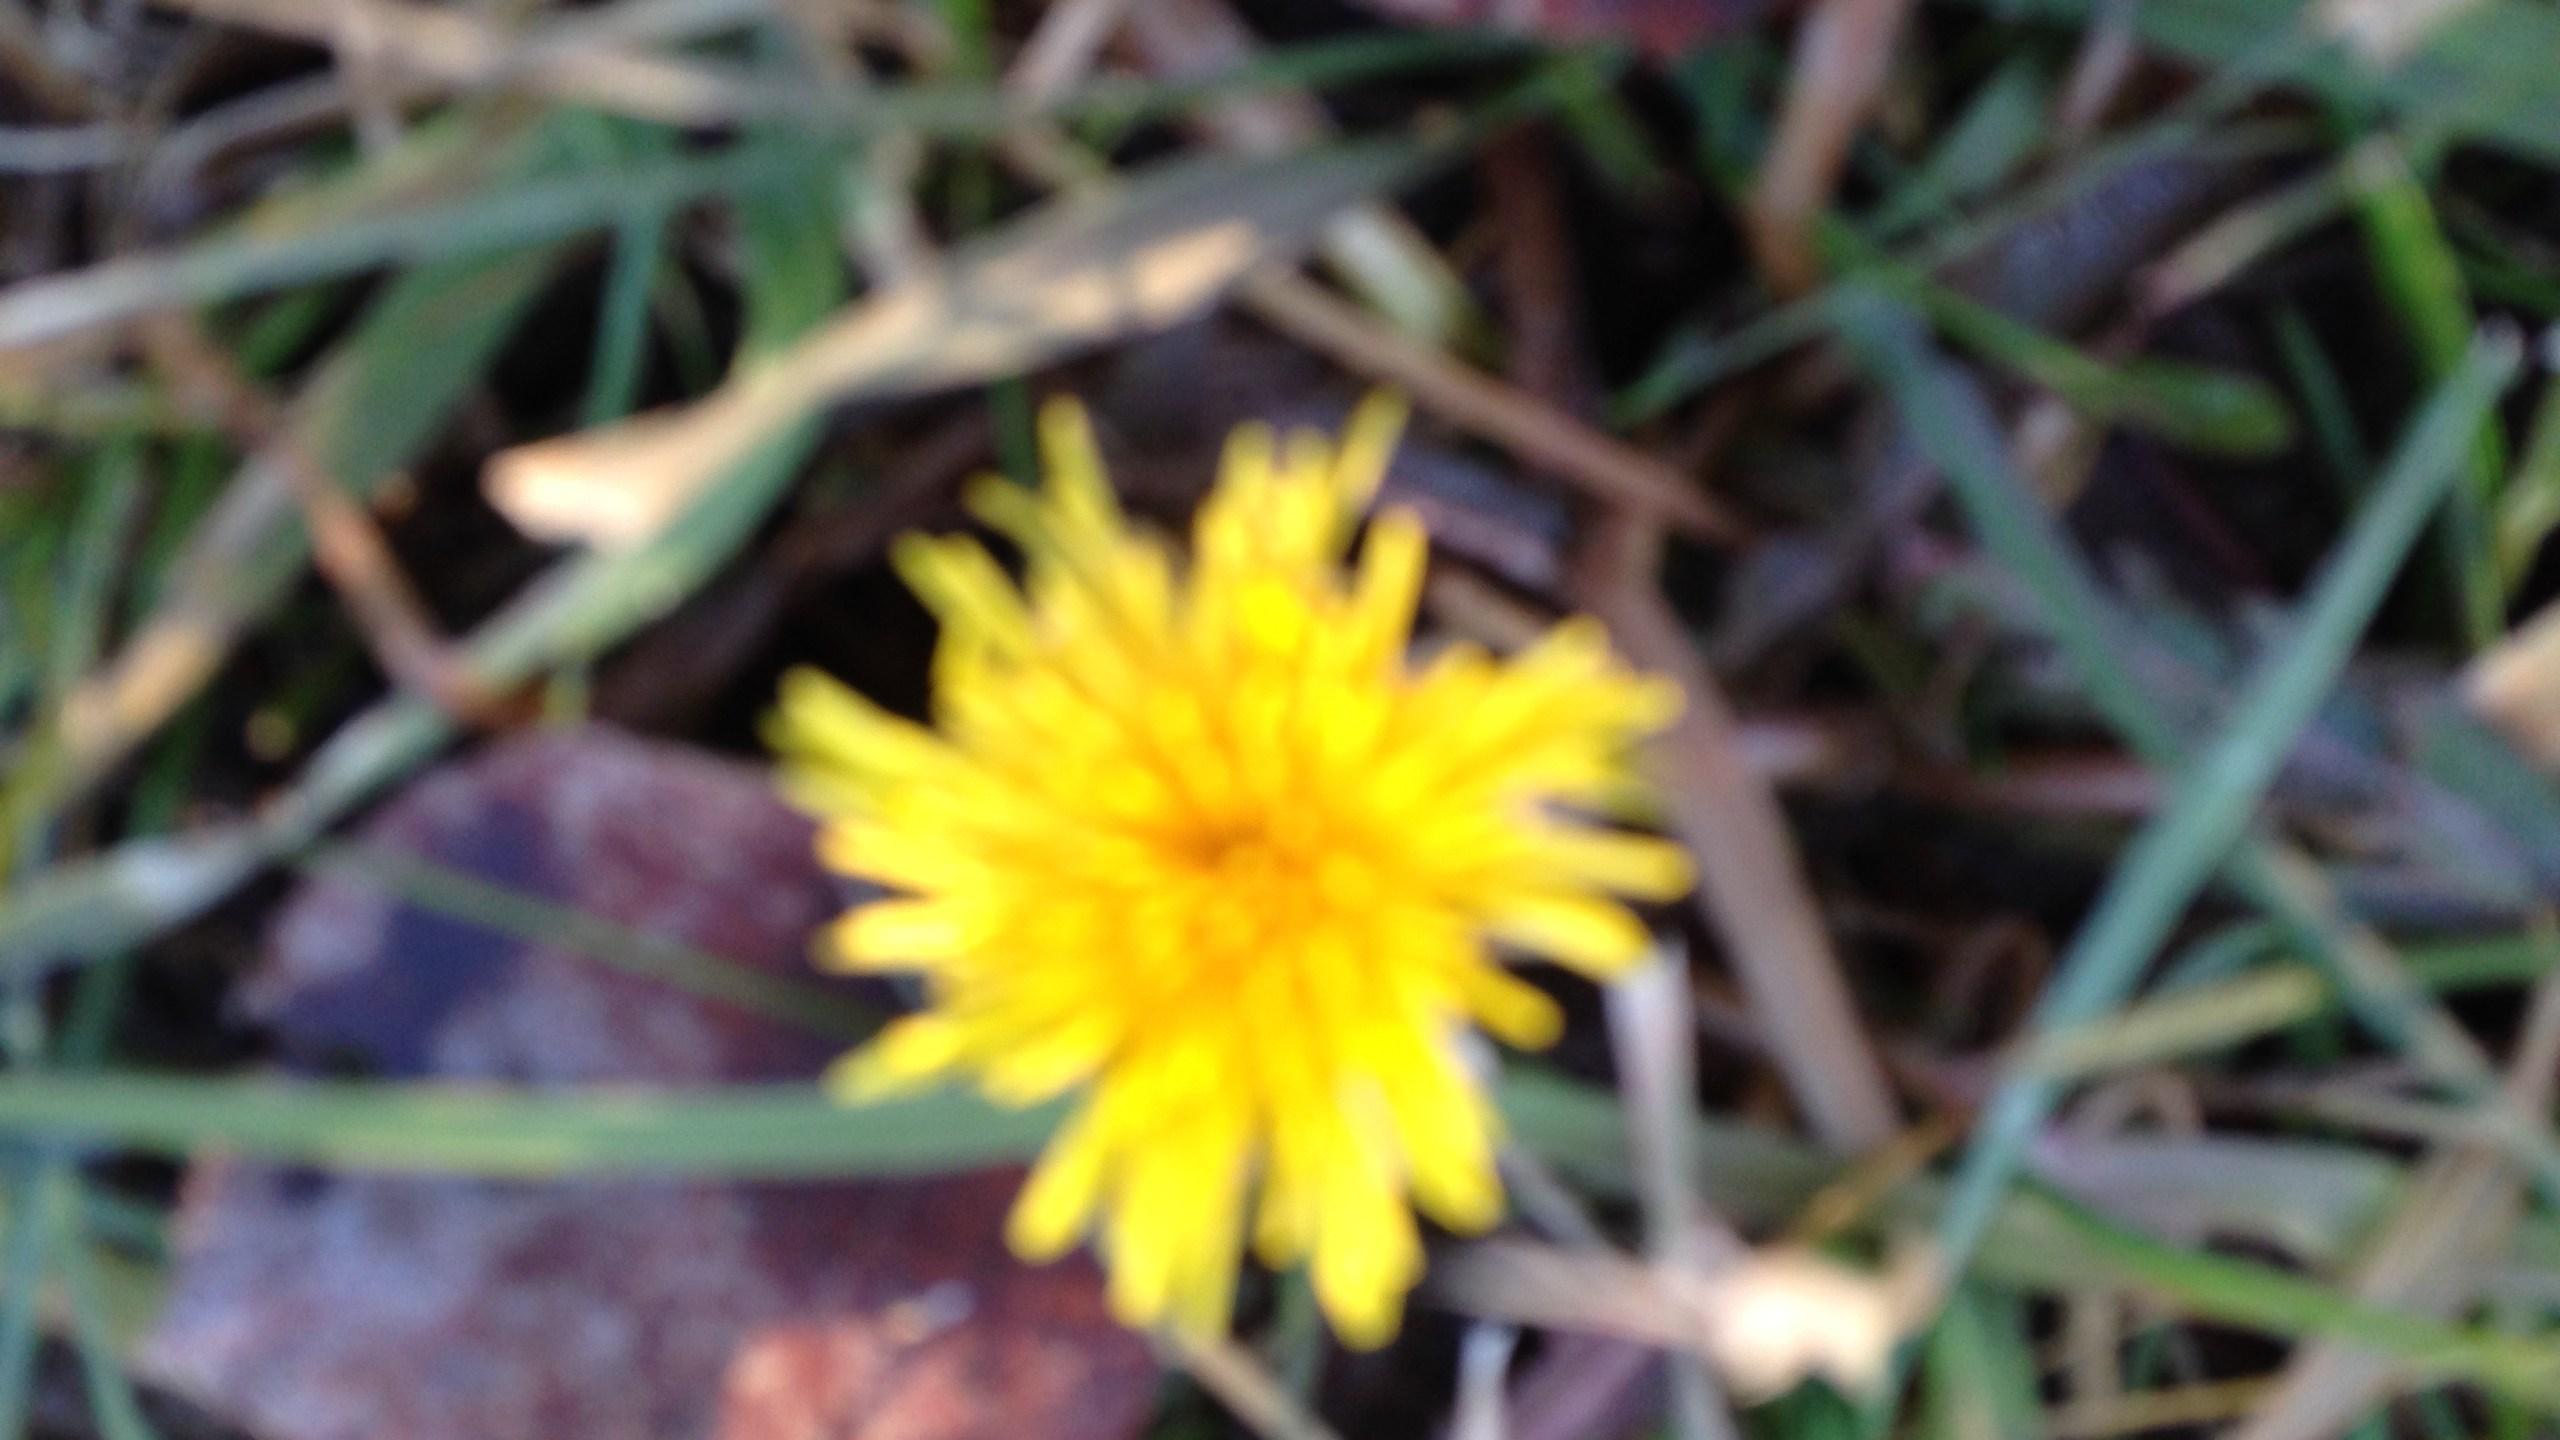 Dandelion 1 5 19 Alpine Elem. School  011_1547191357062.JPG.jpg